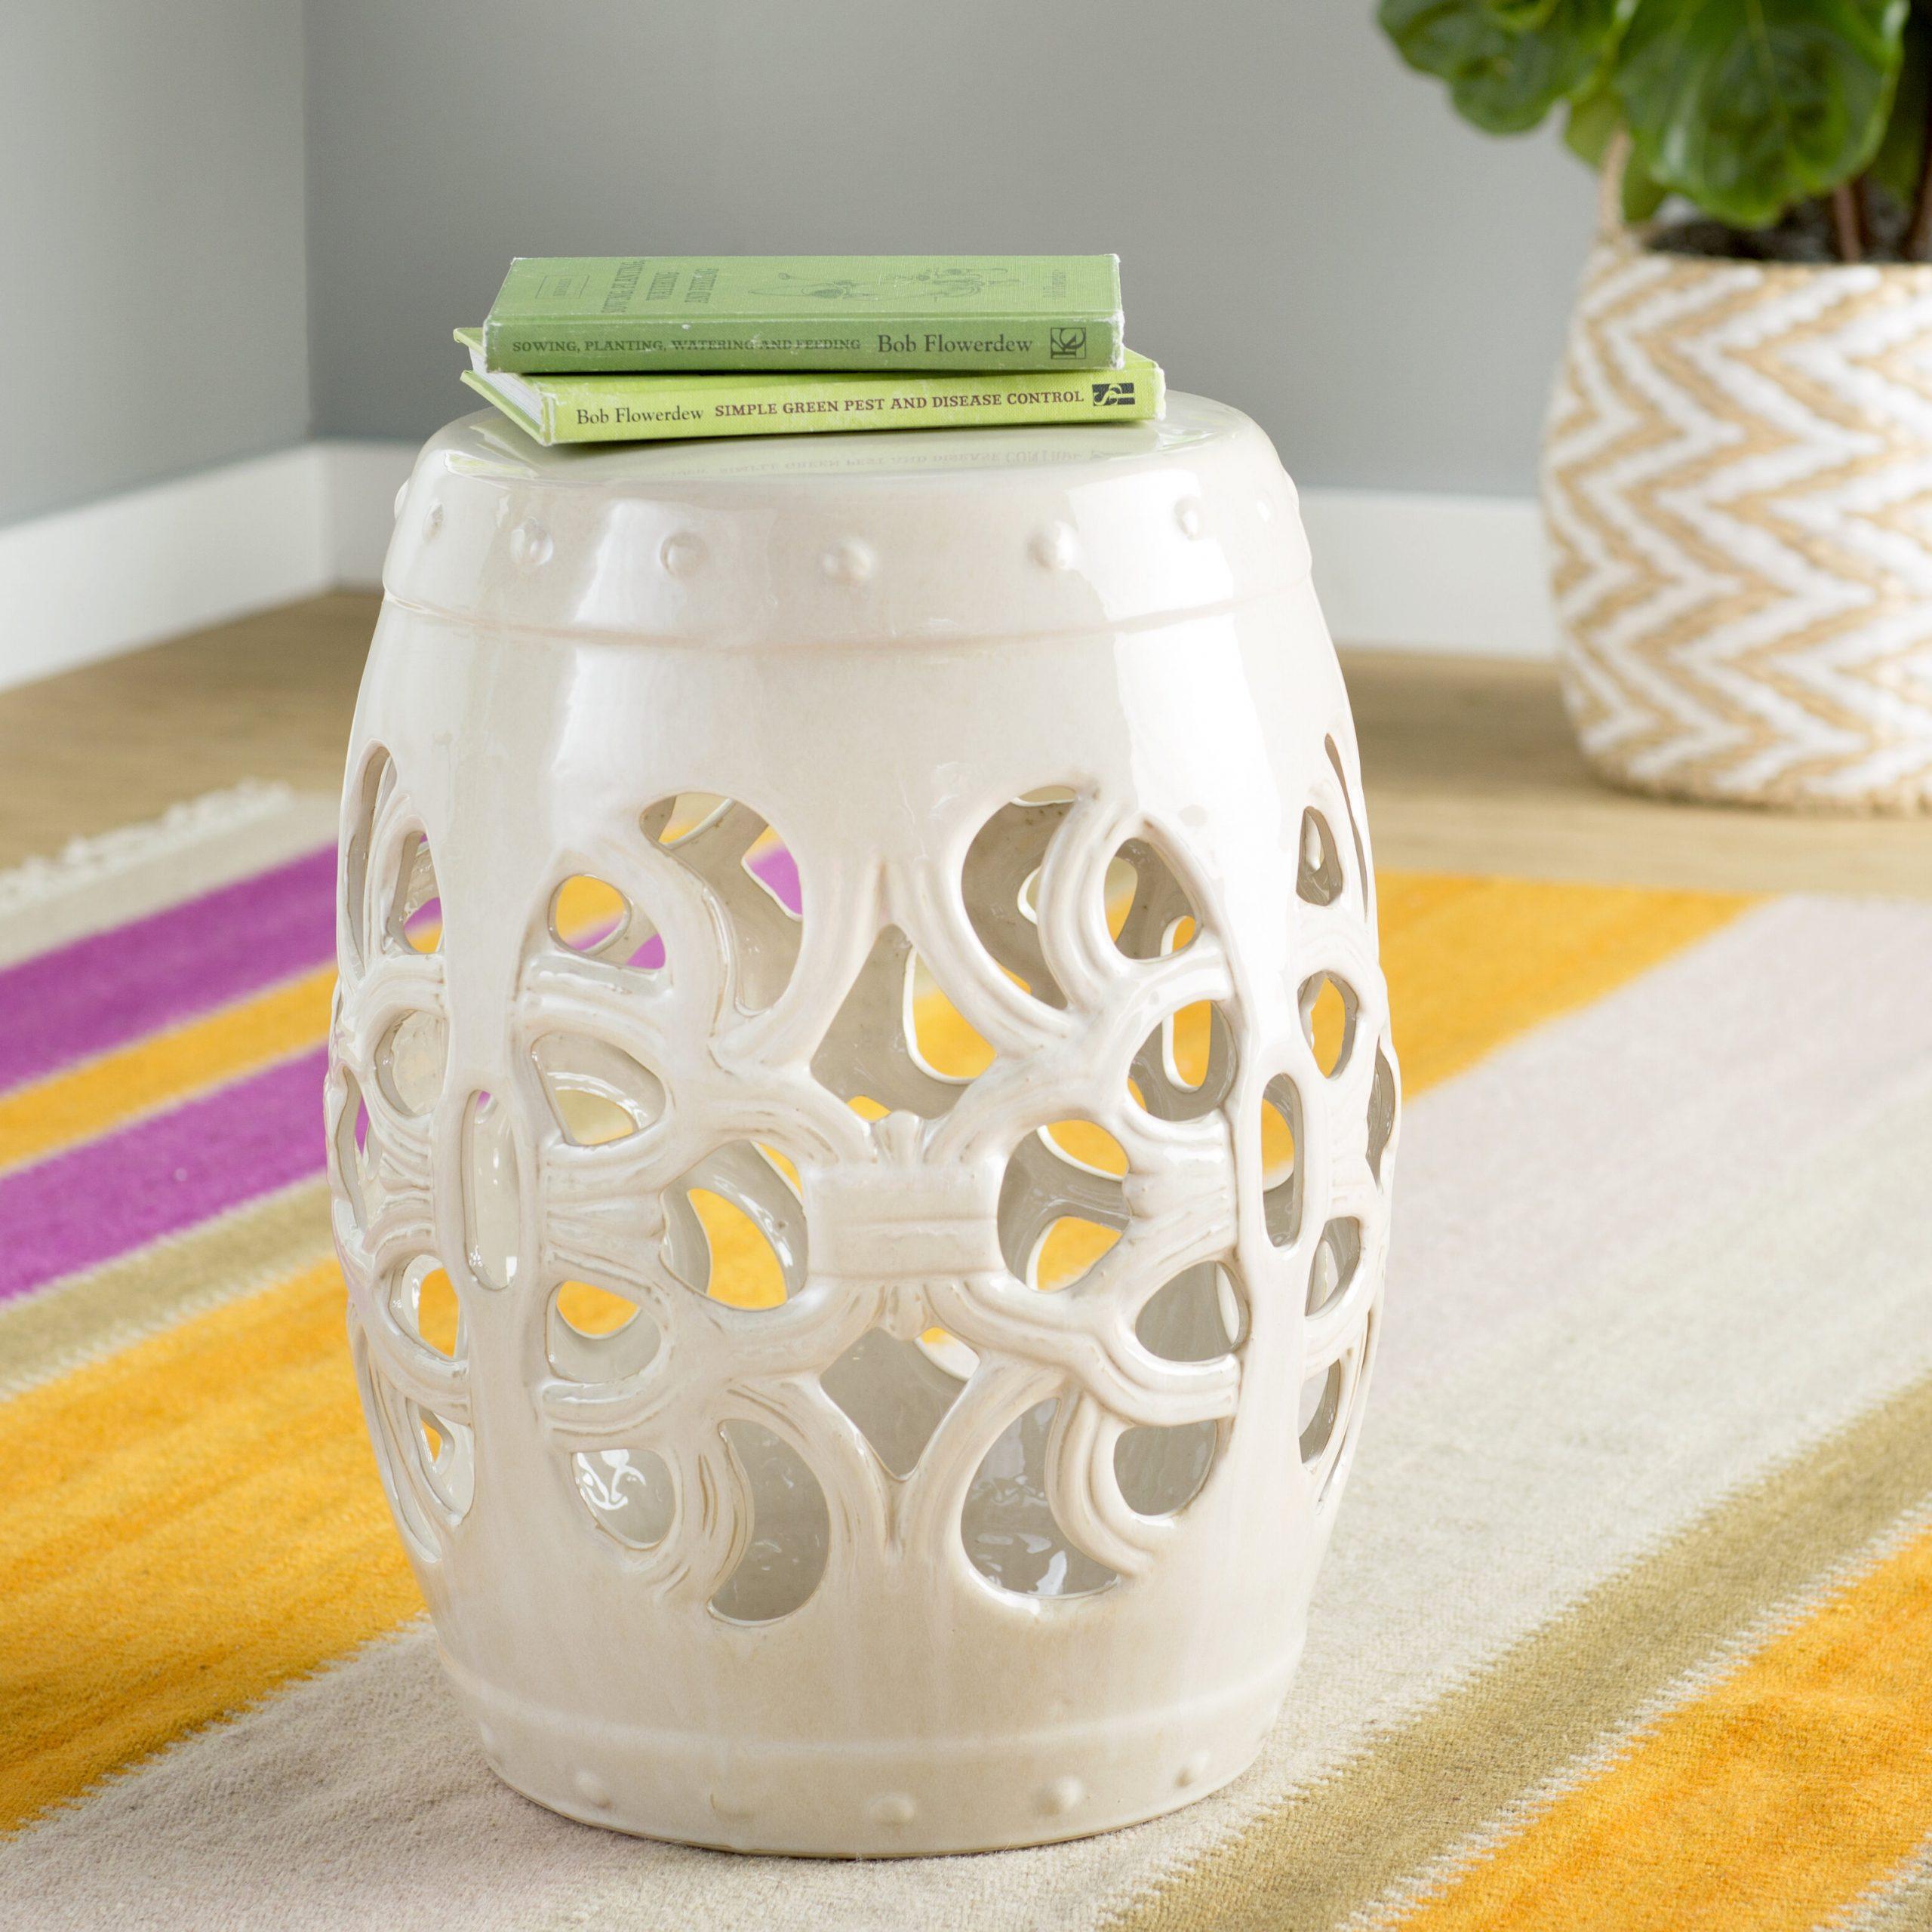 Donofrio Ceramic Garden Stool For Renee Porcelain Garden Stools (View 14 of 25)